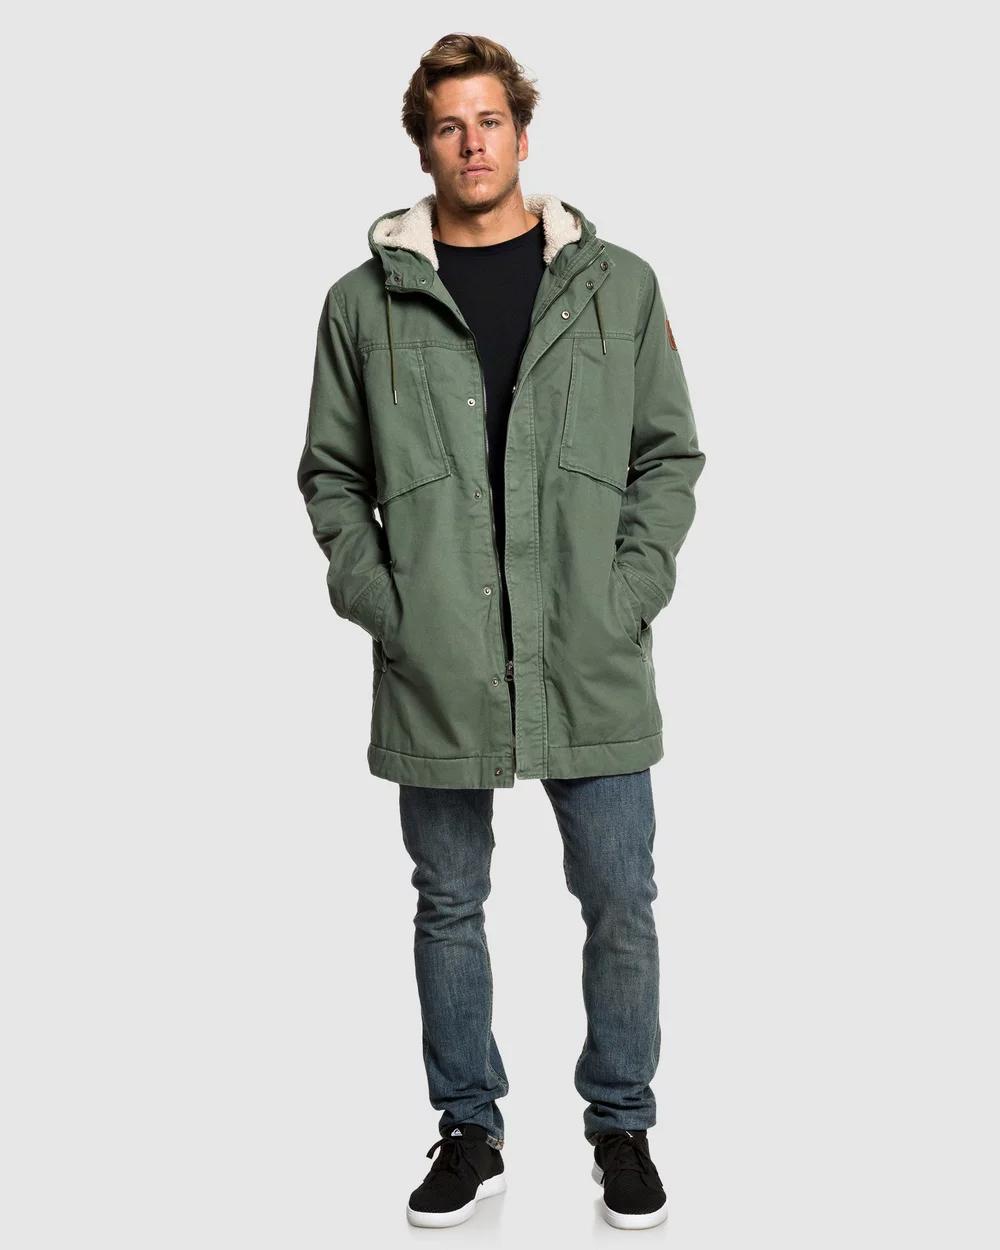 New! Мужская мода осень-зима 2020-2021 тенденции 87 фото